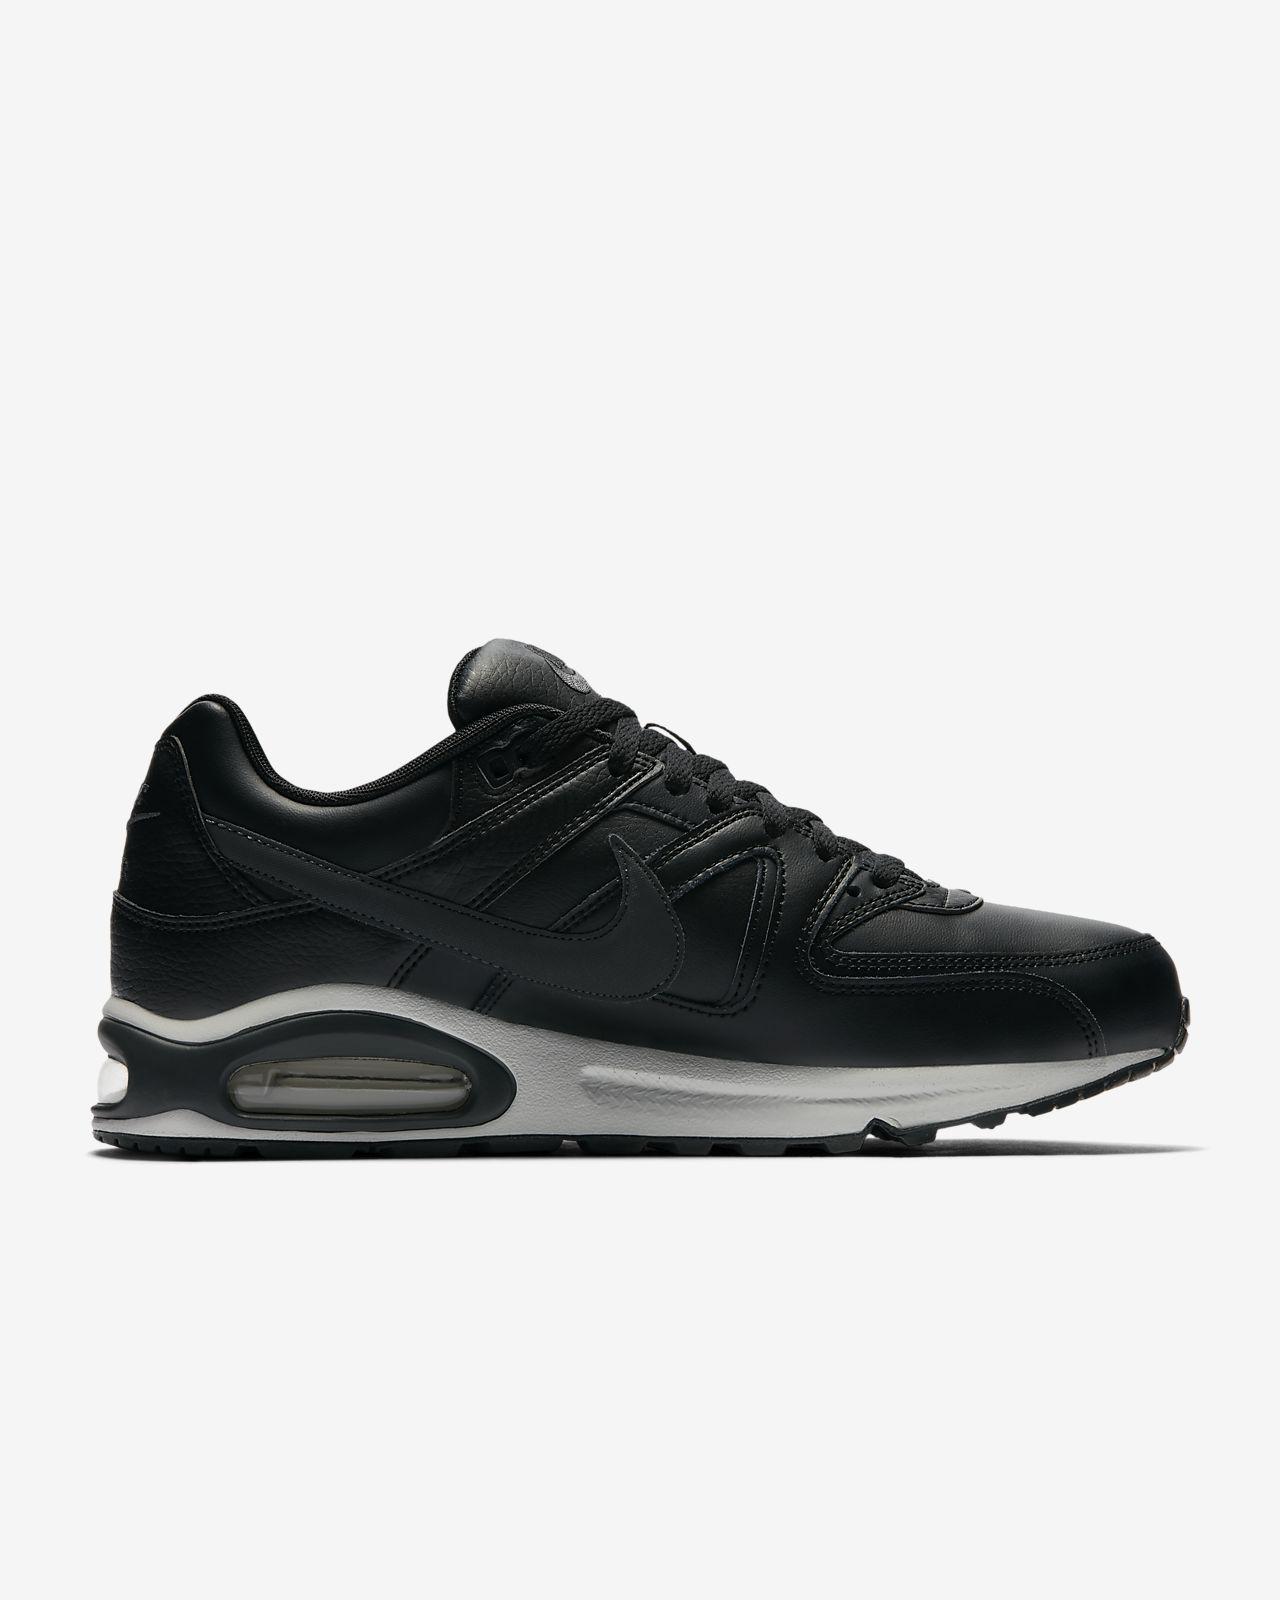 Nike, Buty męskie, Air Max 1 Essential, rozmiar 47 Ceny i